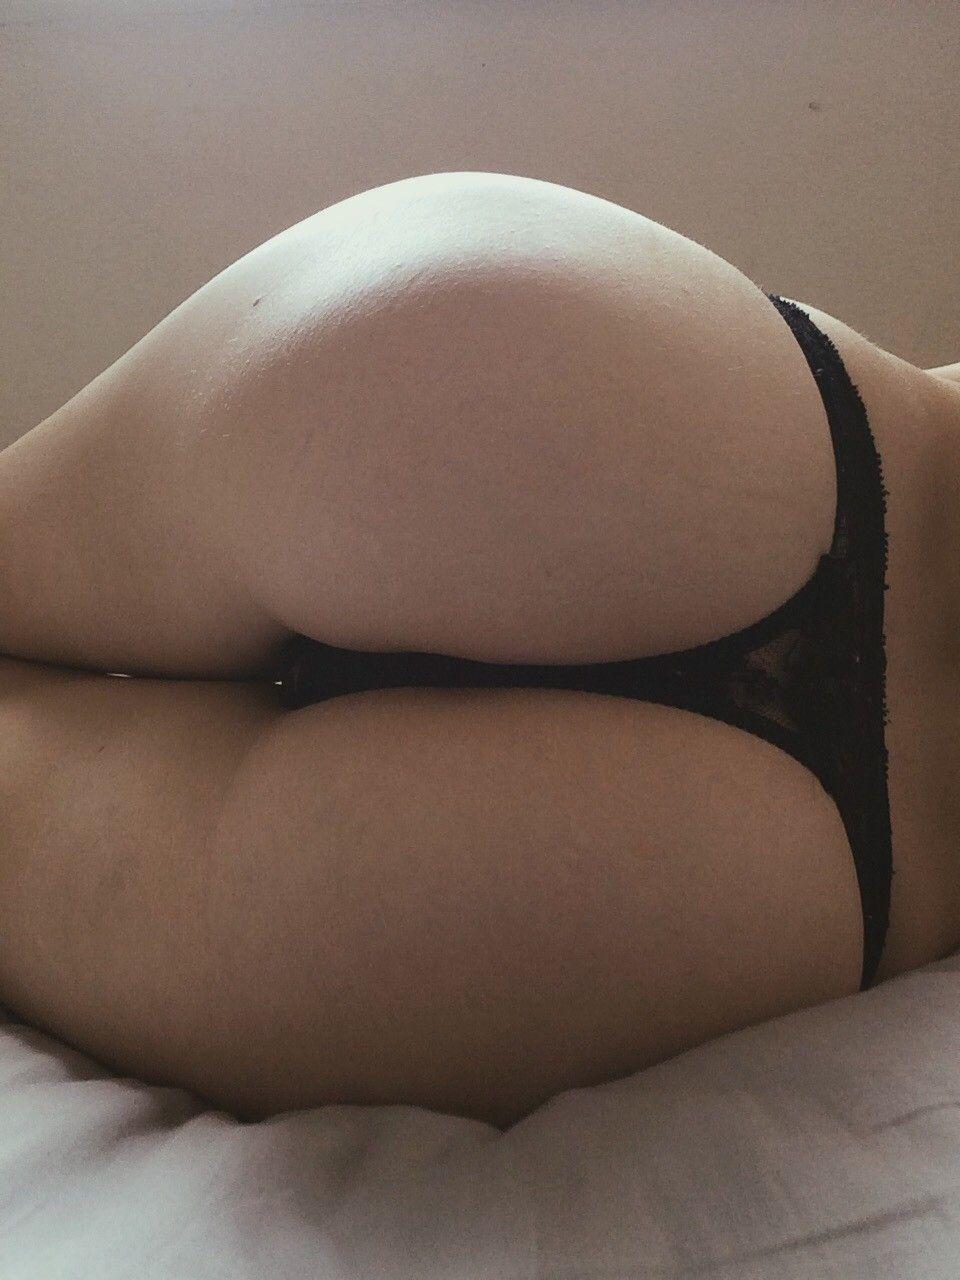 Pin By Eduardo On Girls Sexy Ass Bbw Tits